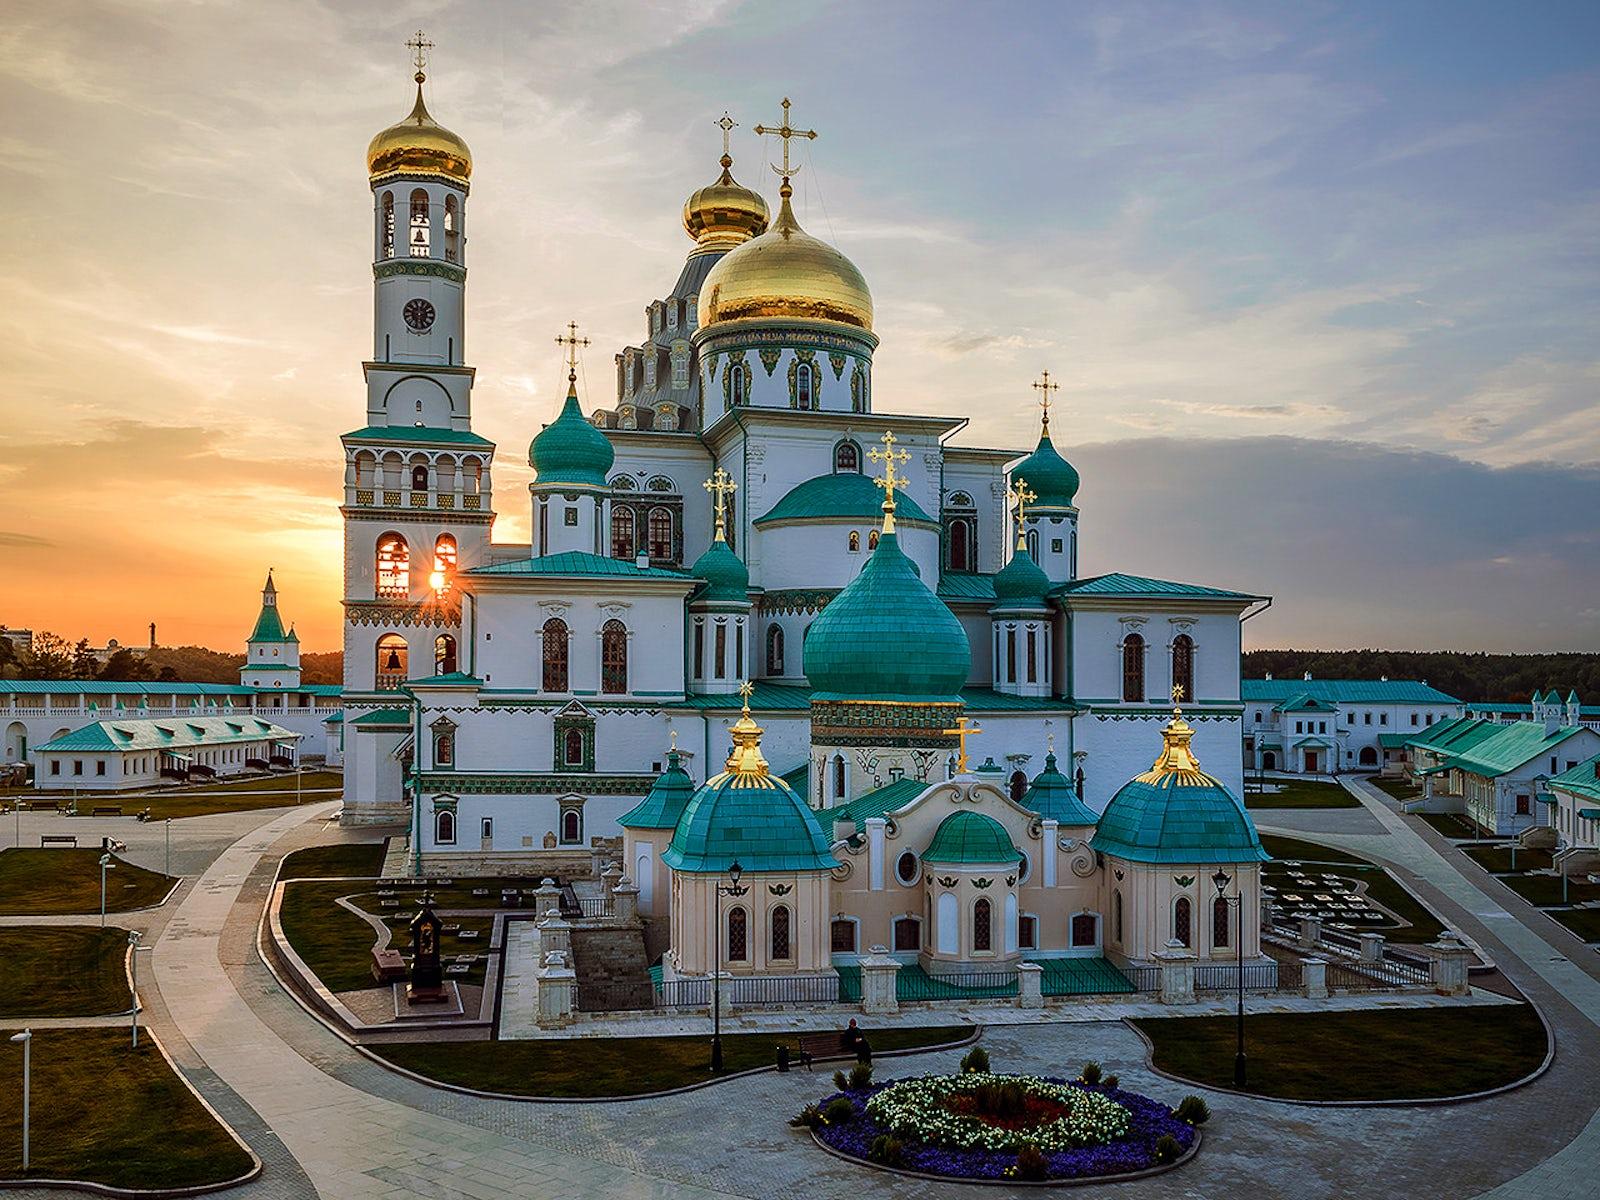 Cover photo © credits to Yury Golovkin